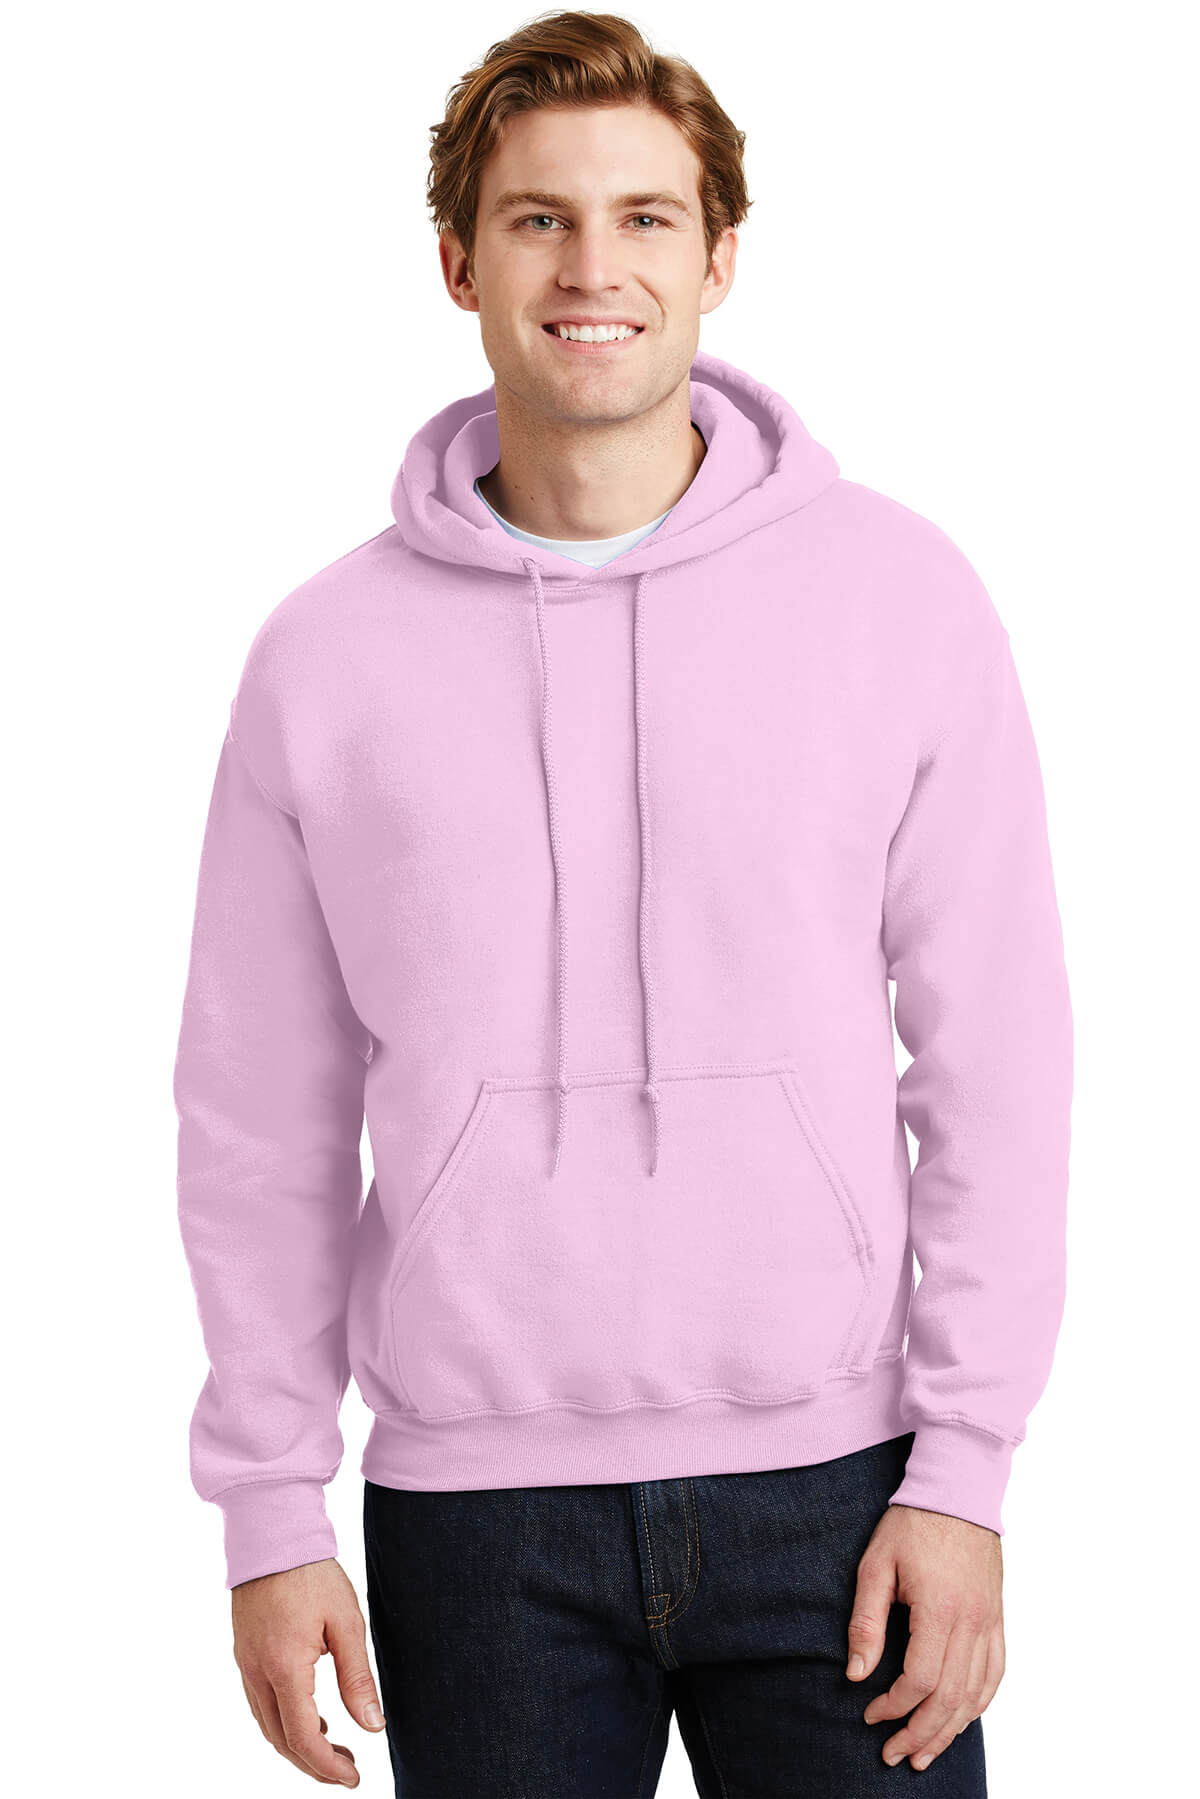 18500-light-pink-1